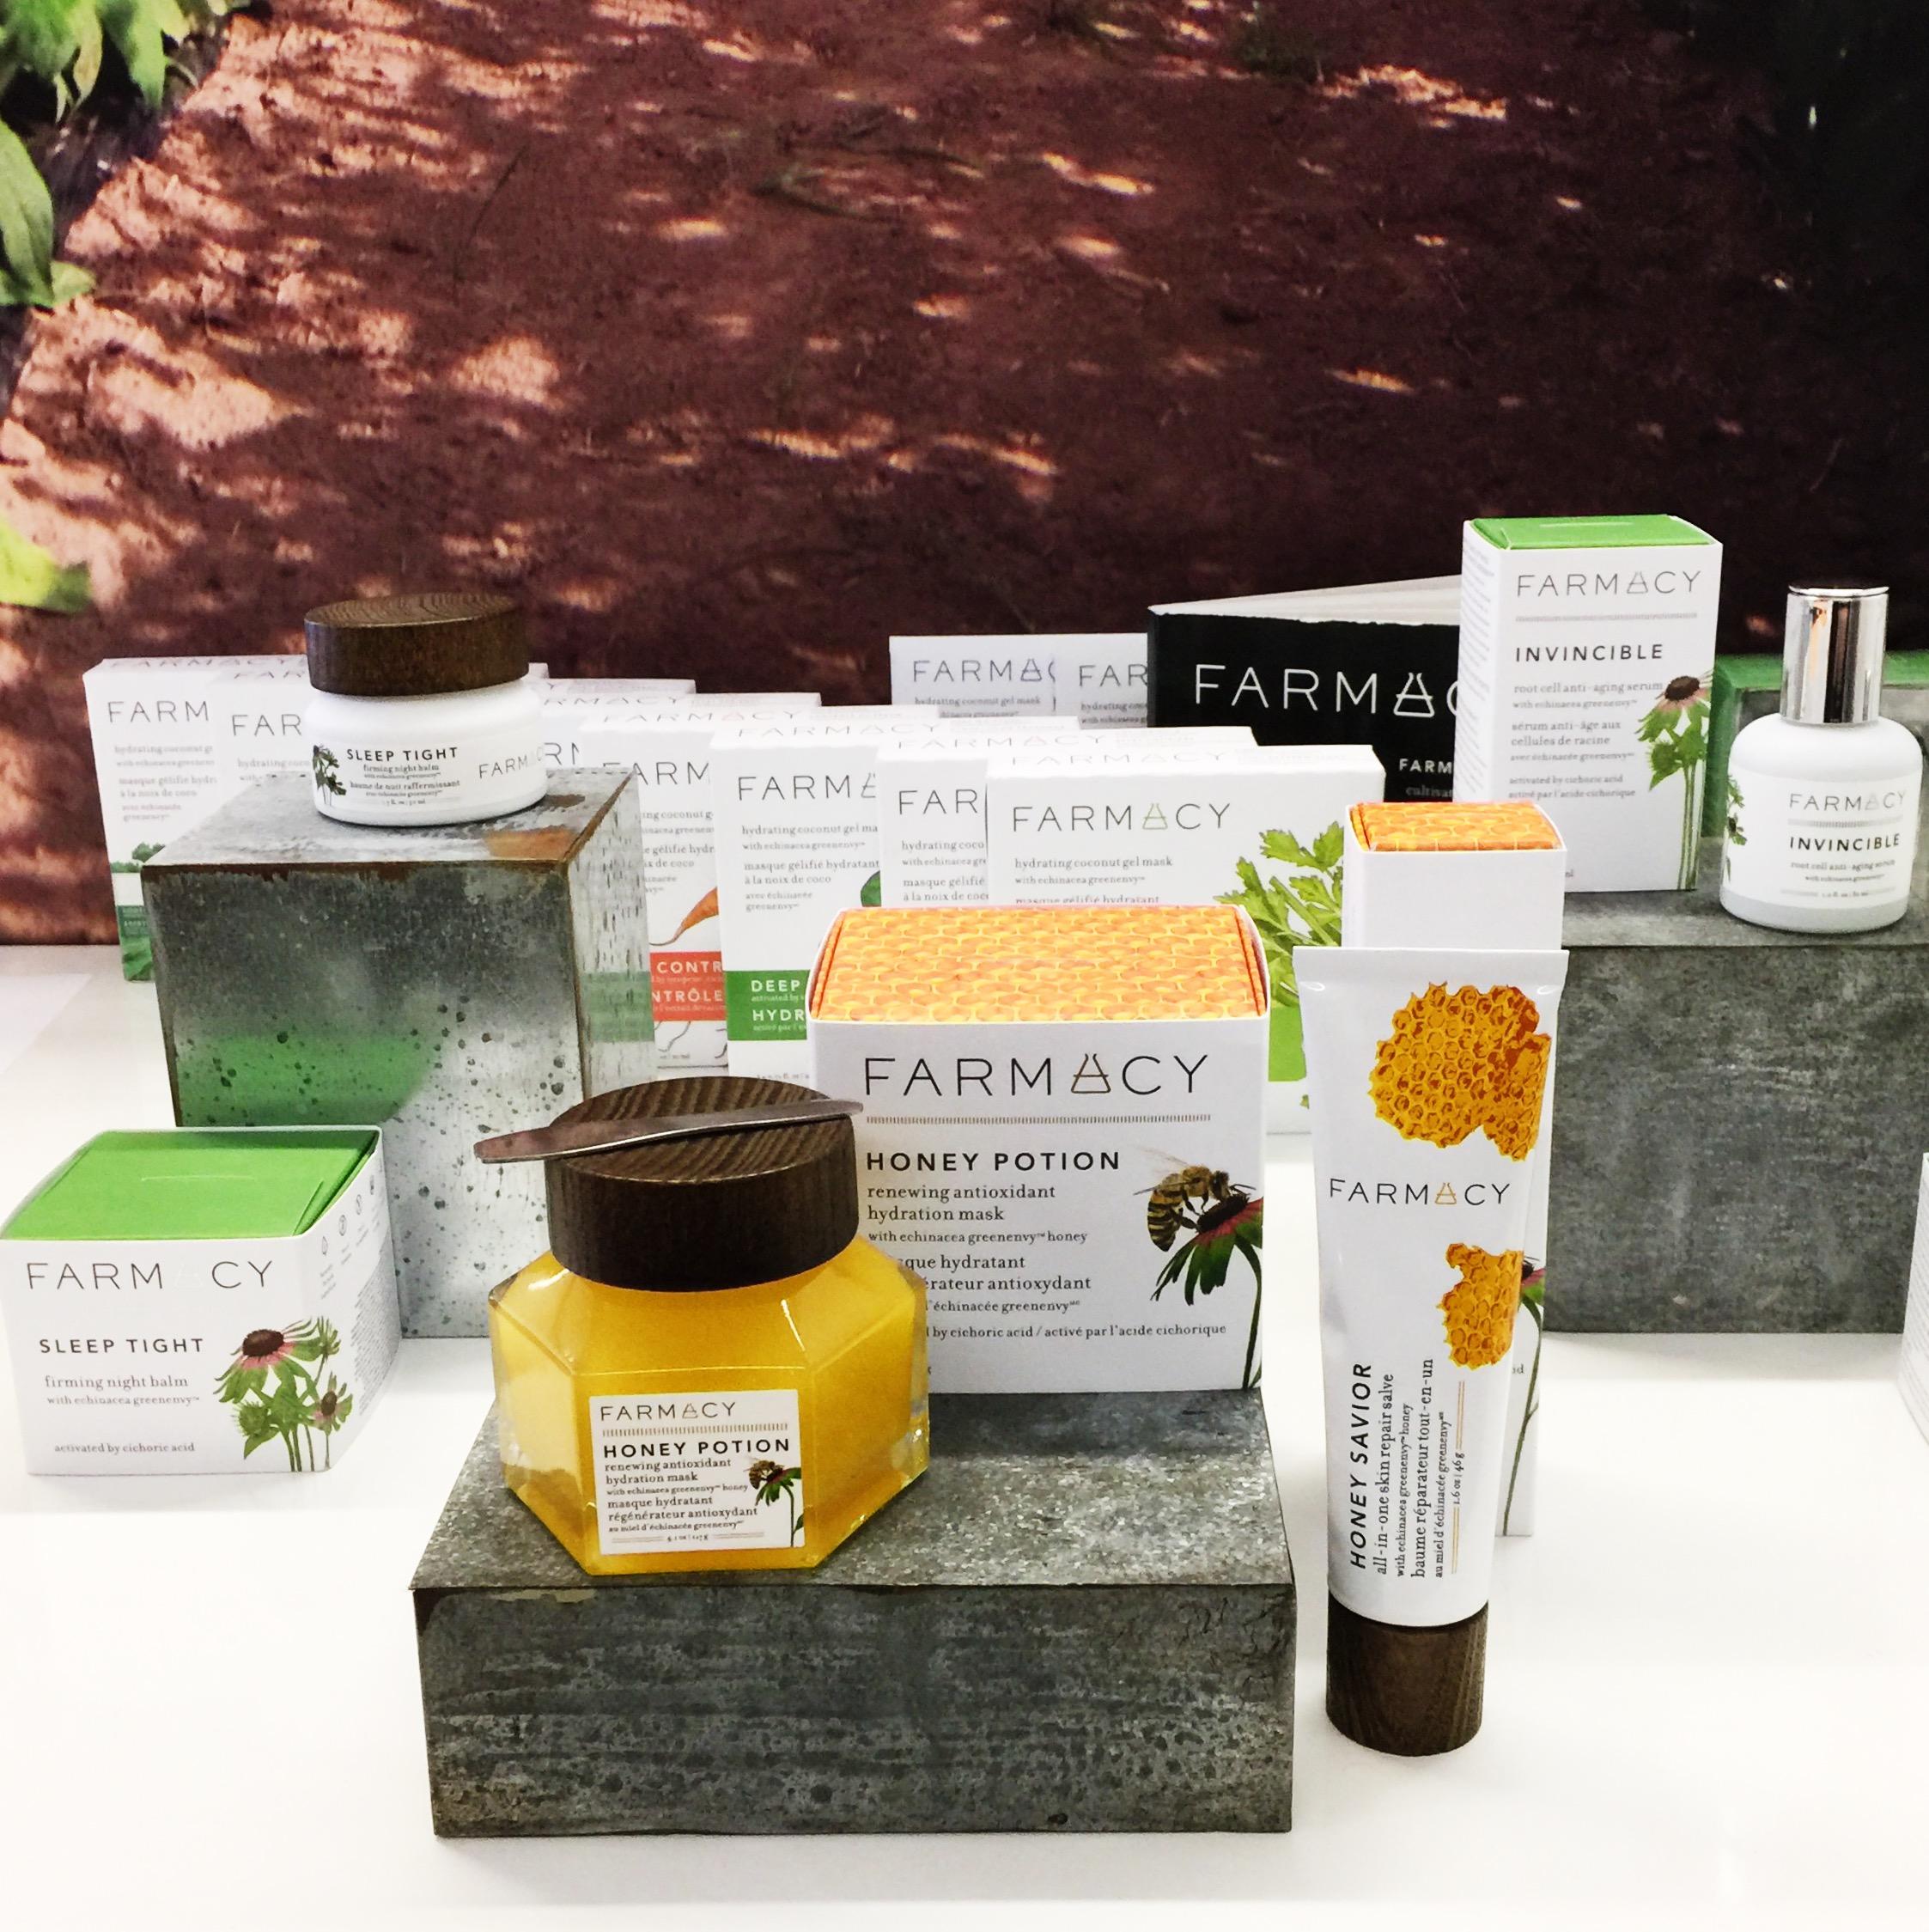 Marisa Robinson Beauty Blogger Sephora Exclusive Brands Showcase 2017 Farmacy